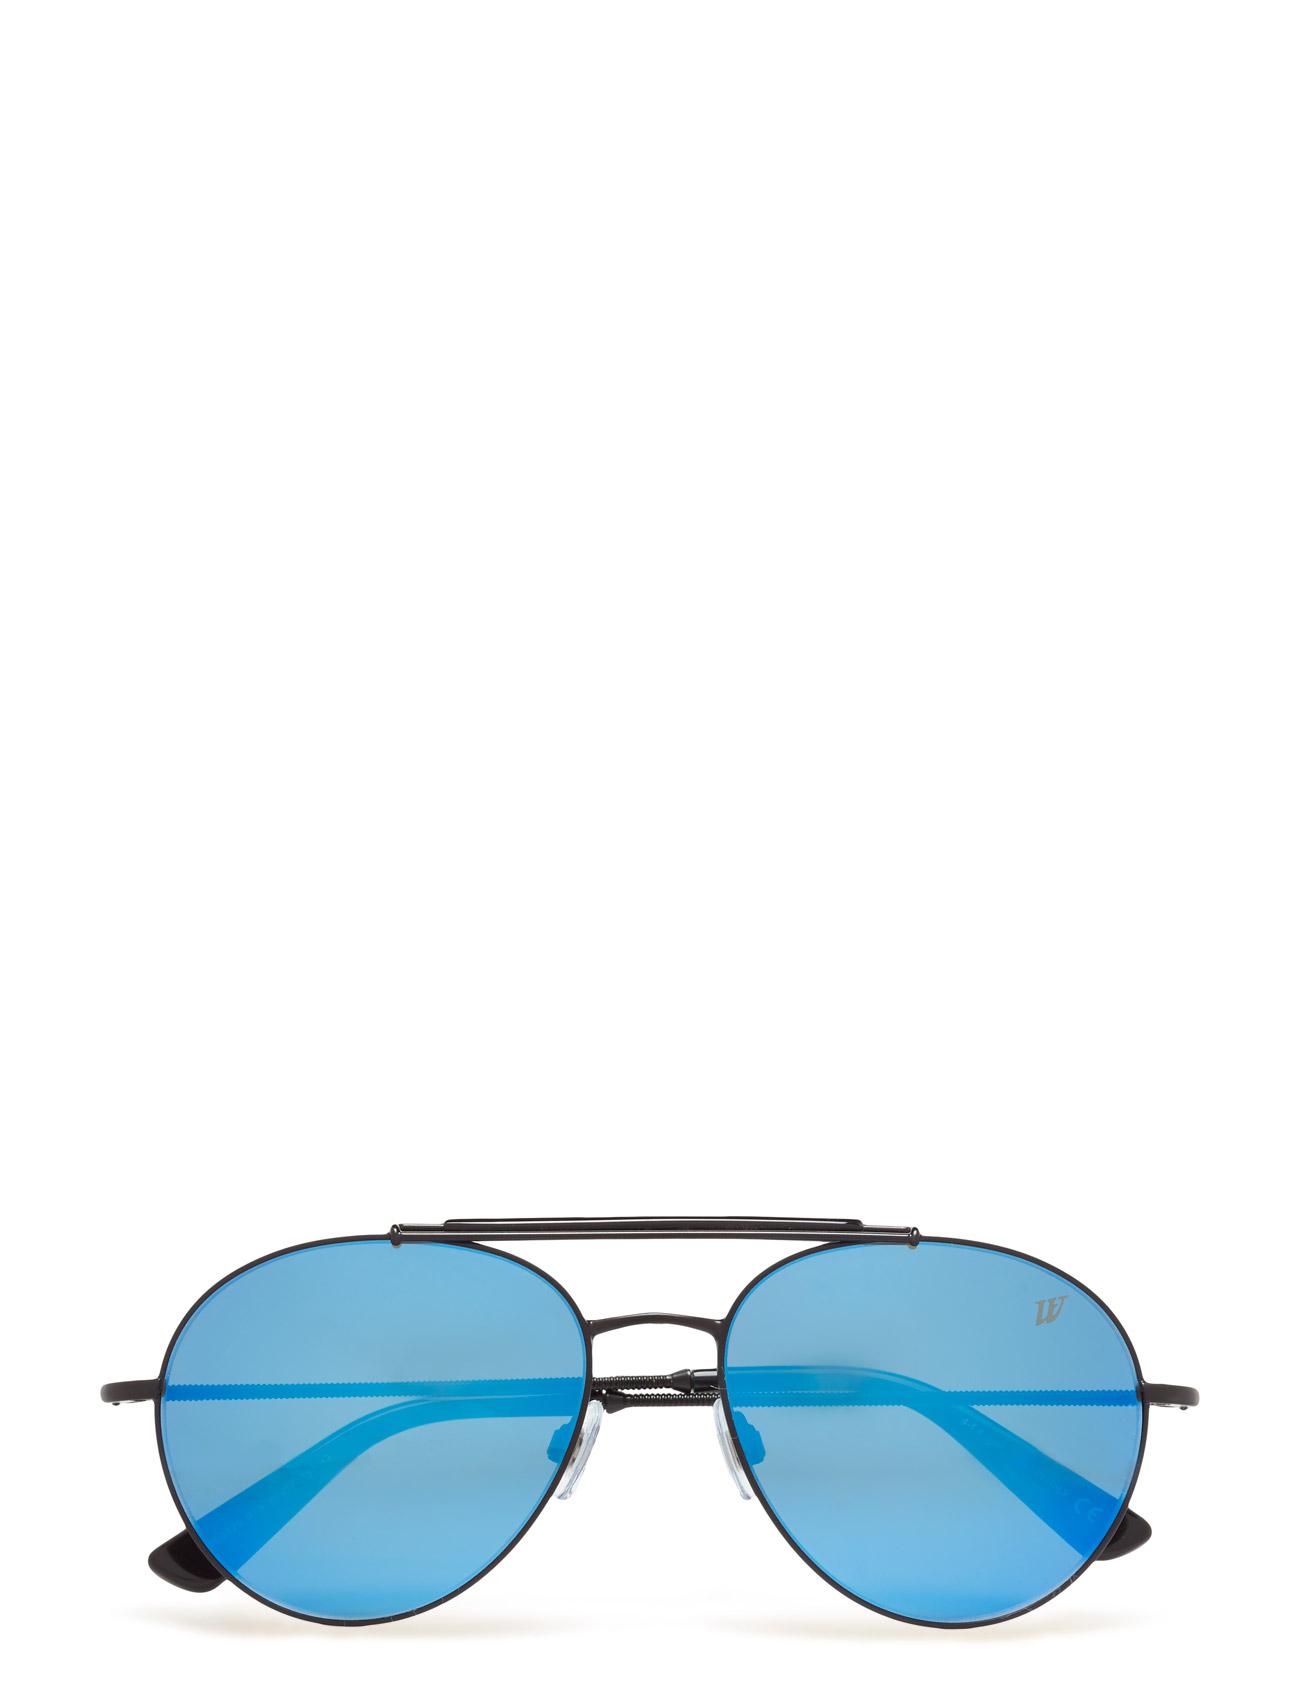 web eyewear – We0126 på boozt.com dk